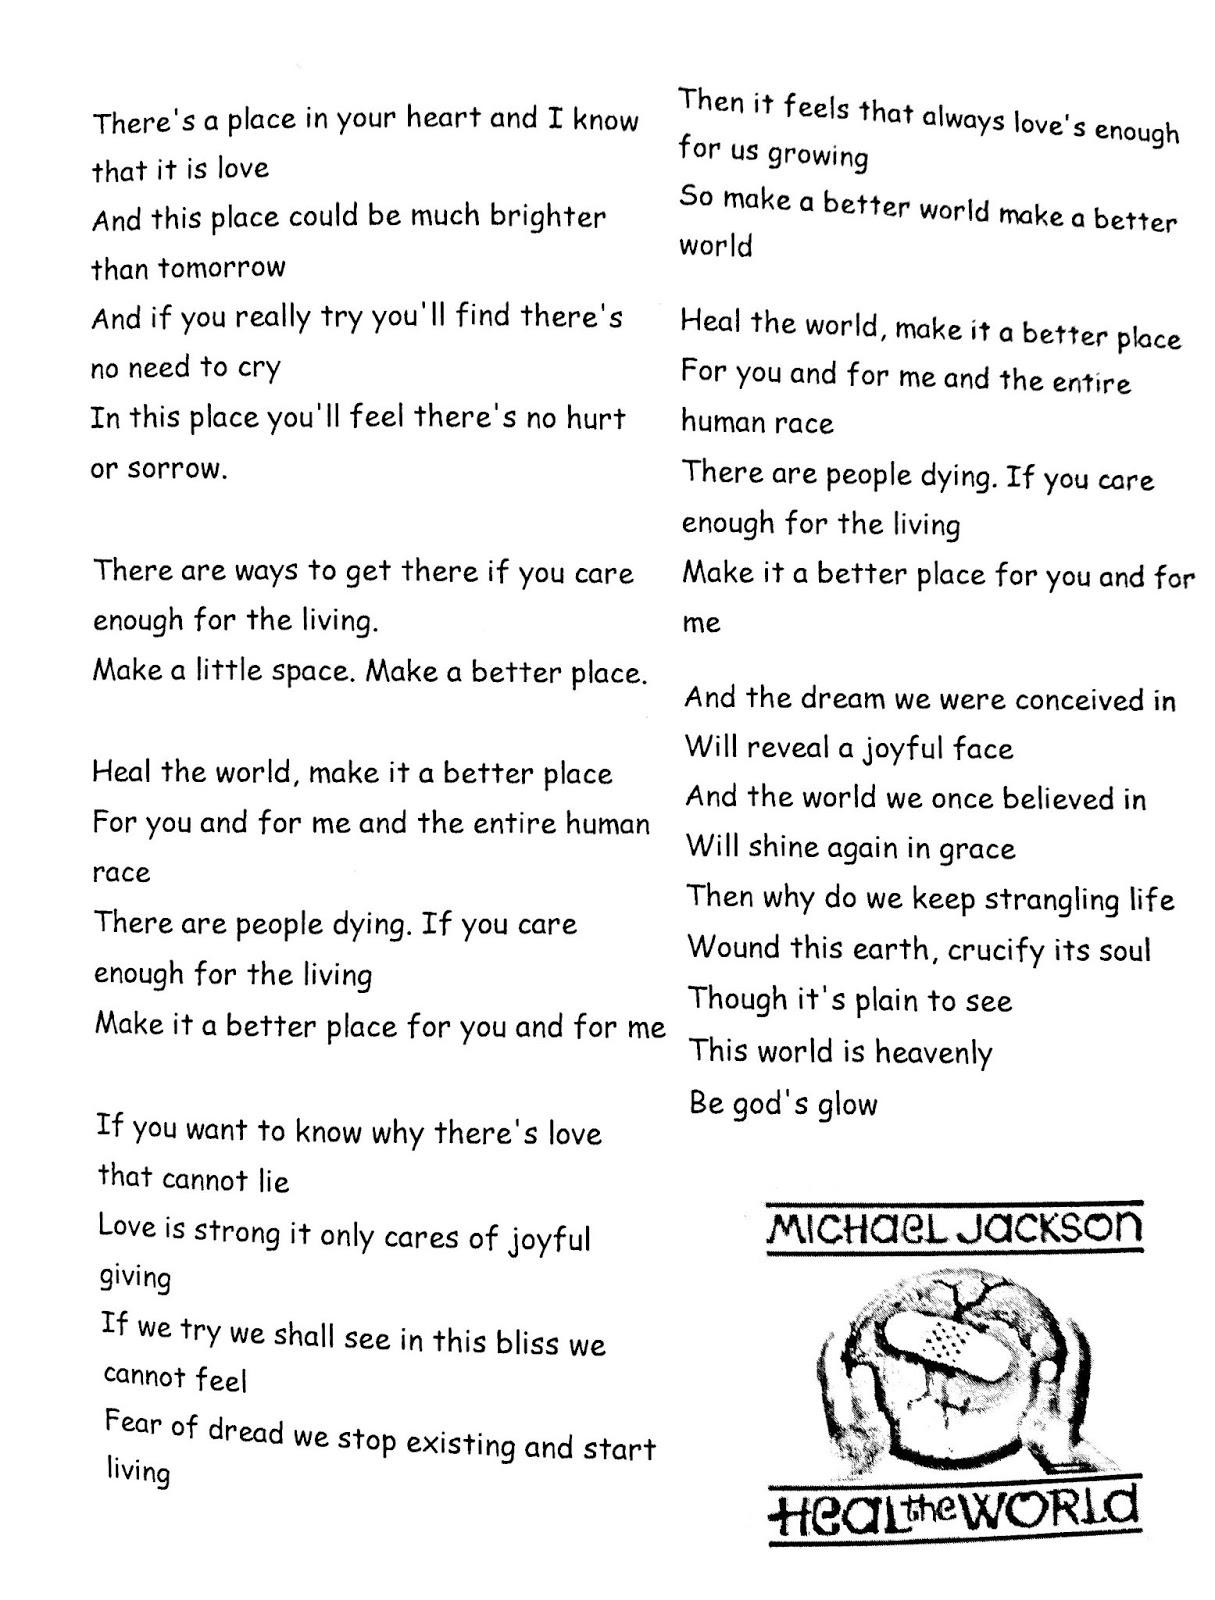 English Blog (5th grade): Song: Heal the world - Michael Jackson